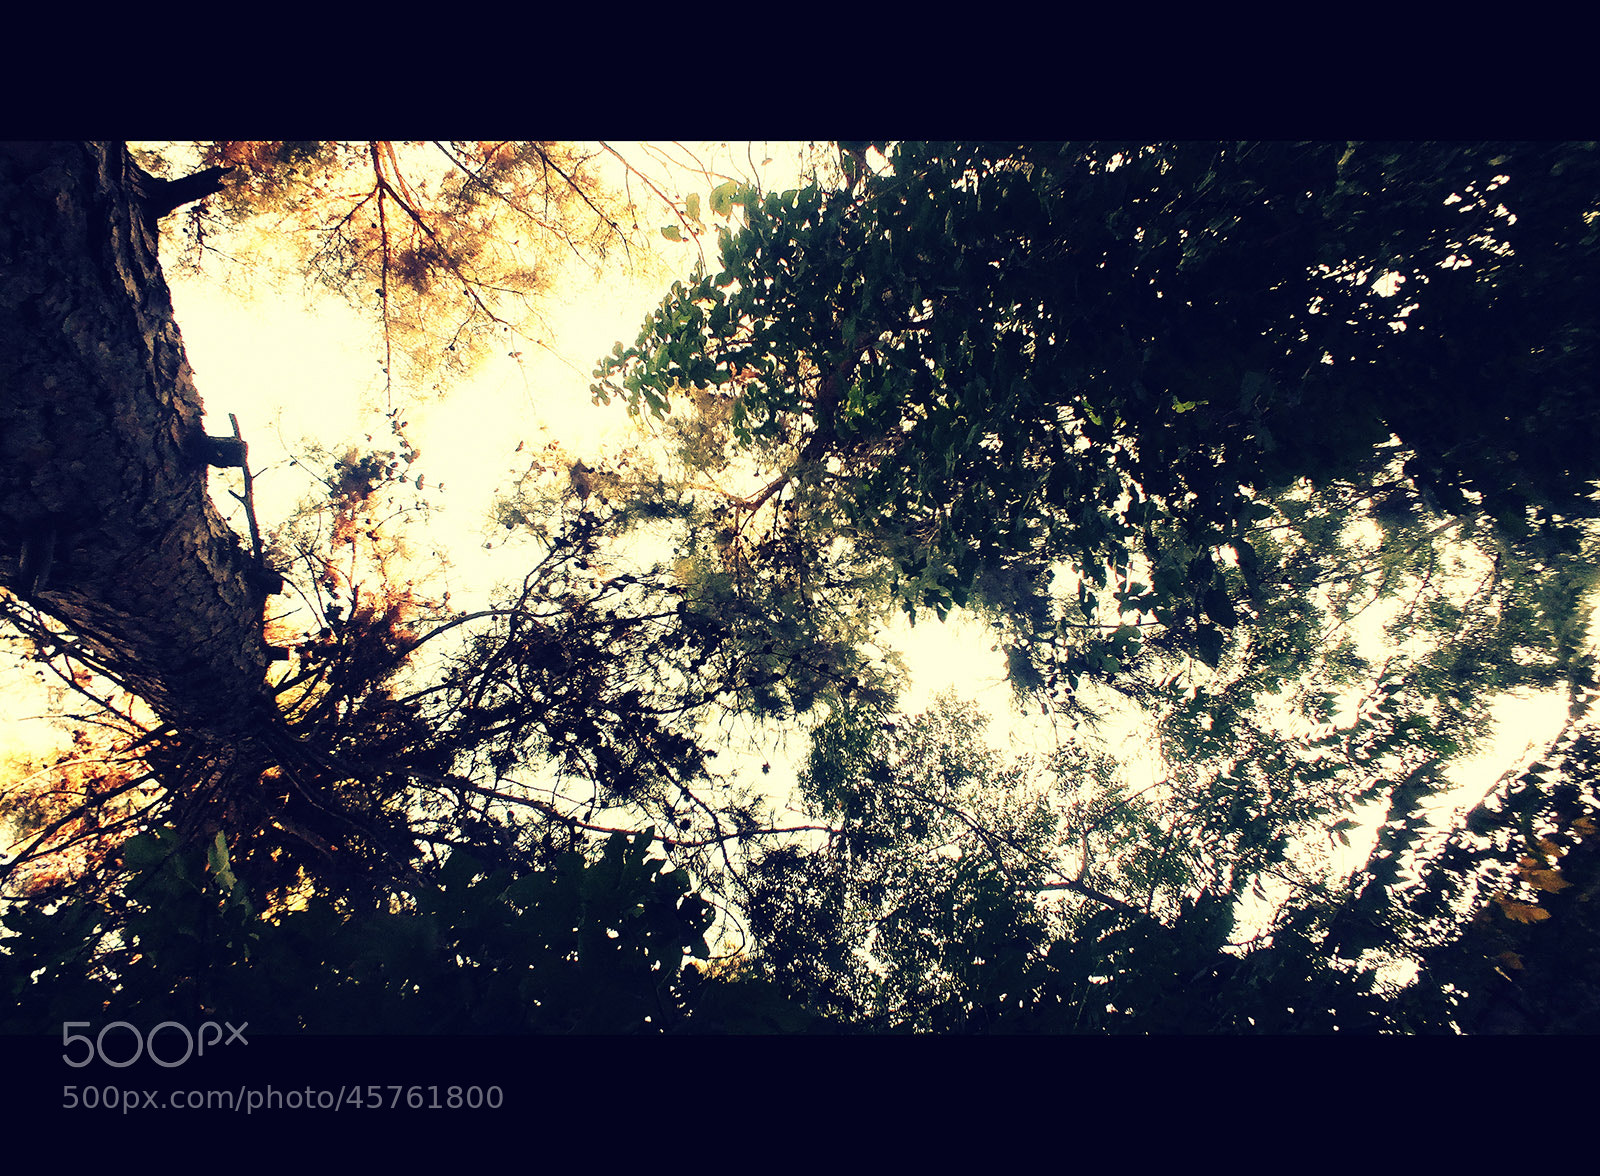 Photograph Autumn by Özlem Canik on 500px